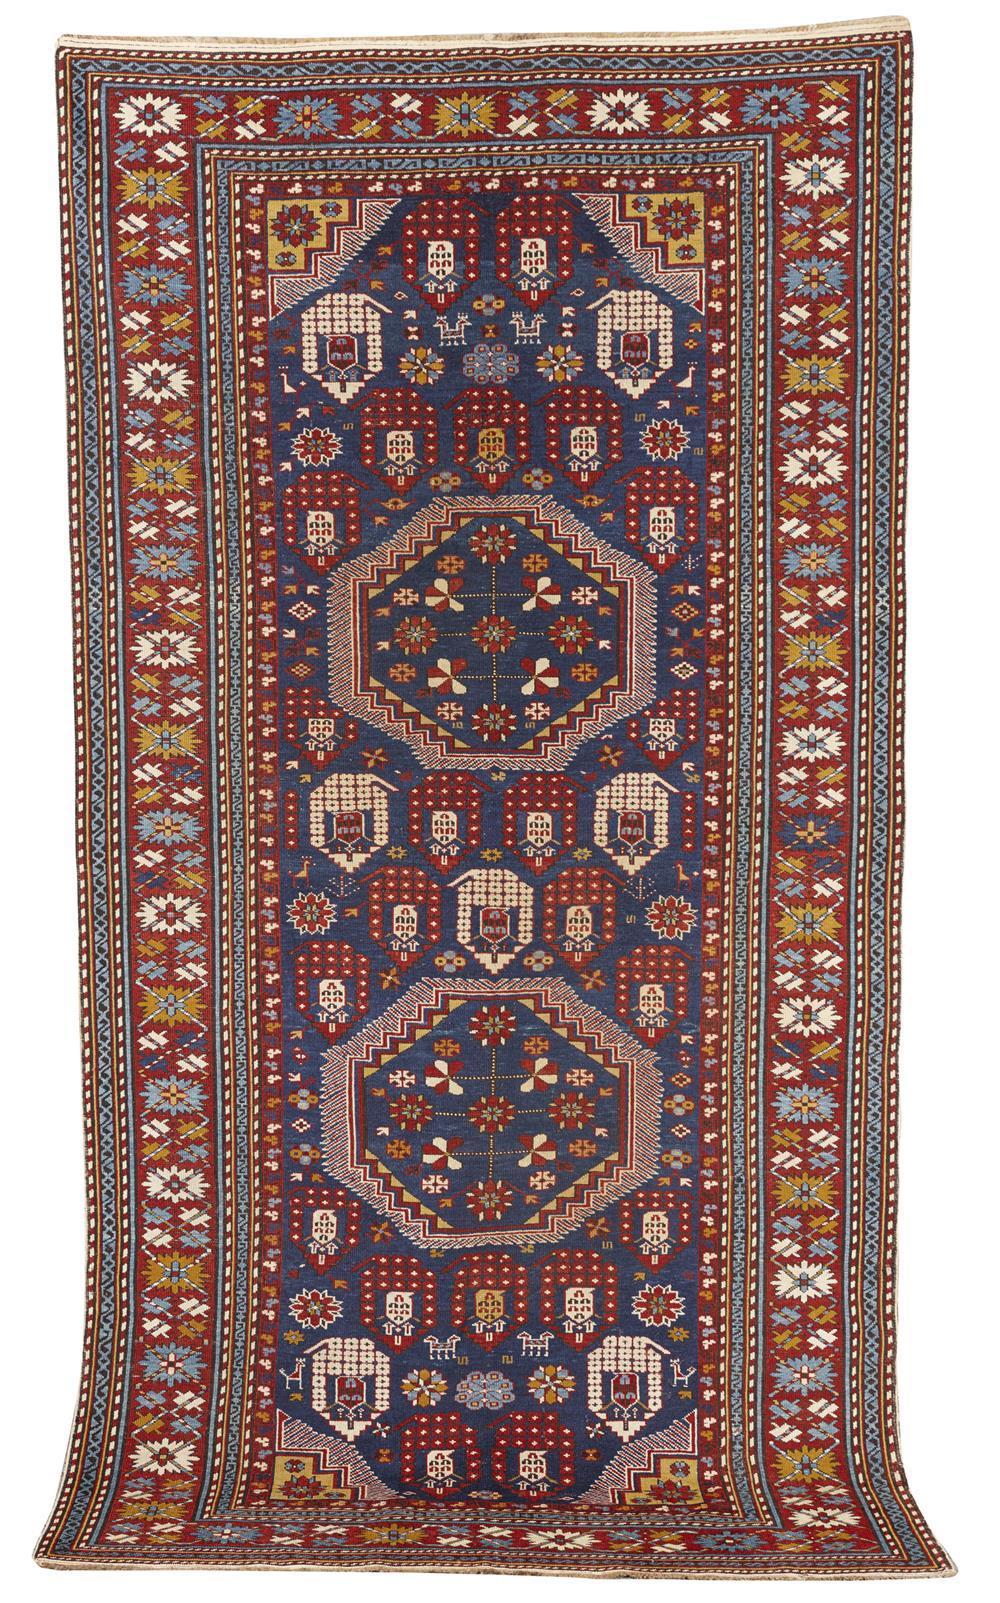 Baku Chila Rug, Caucasus, first quarter 20th century; 8 ft. 11 in. x 4 ft. 7 in.